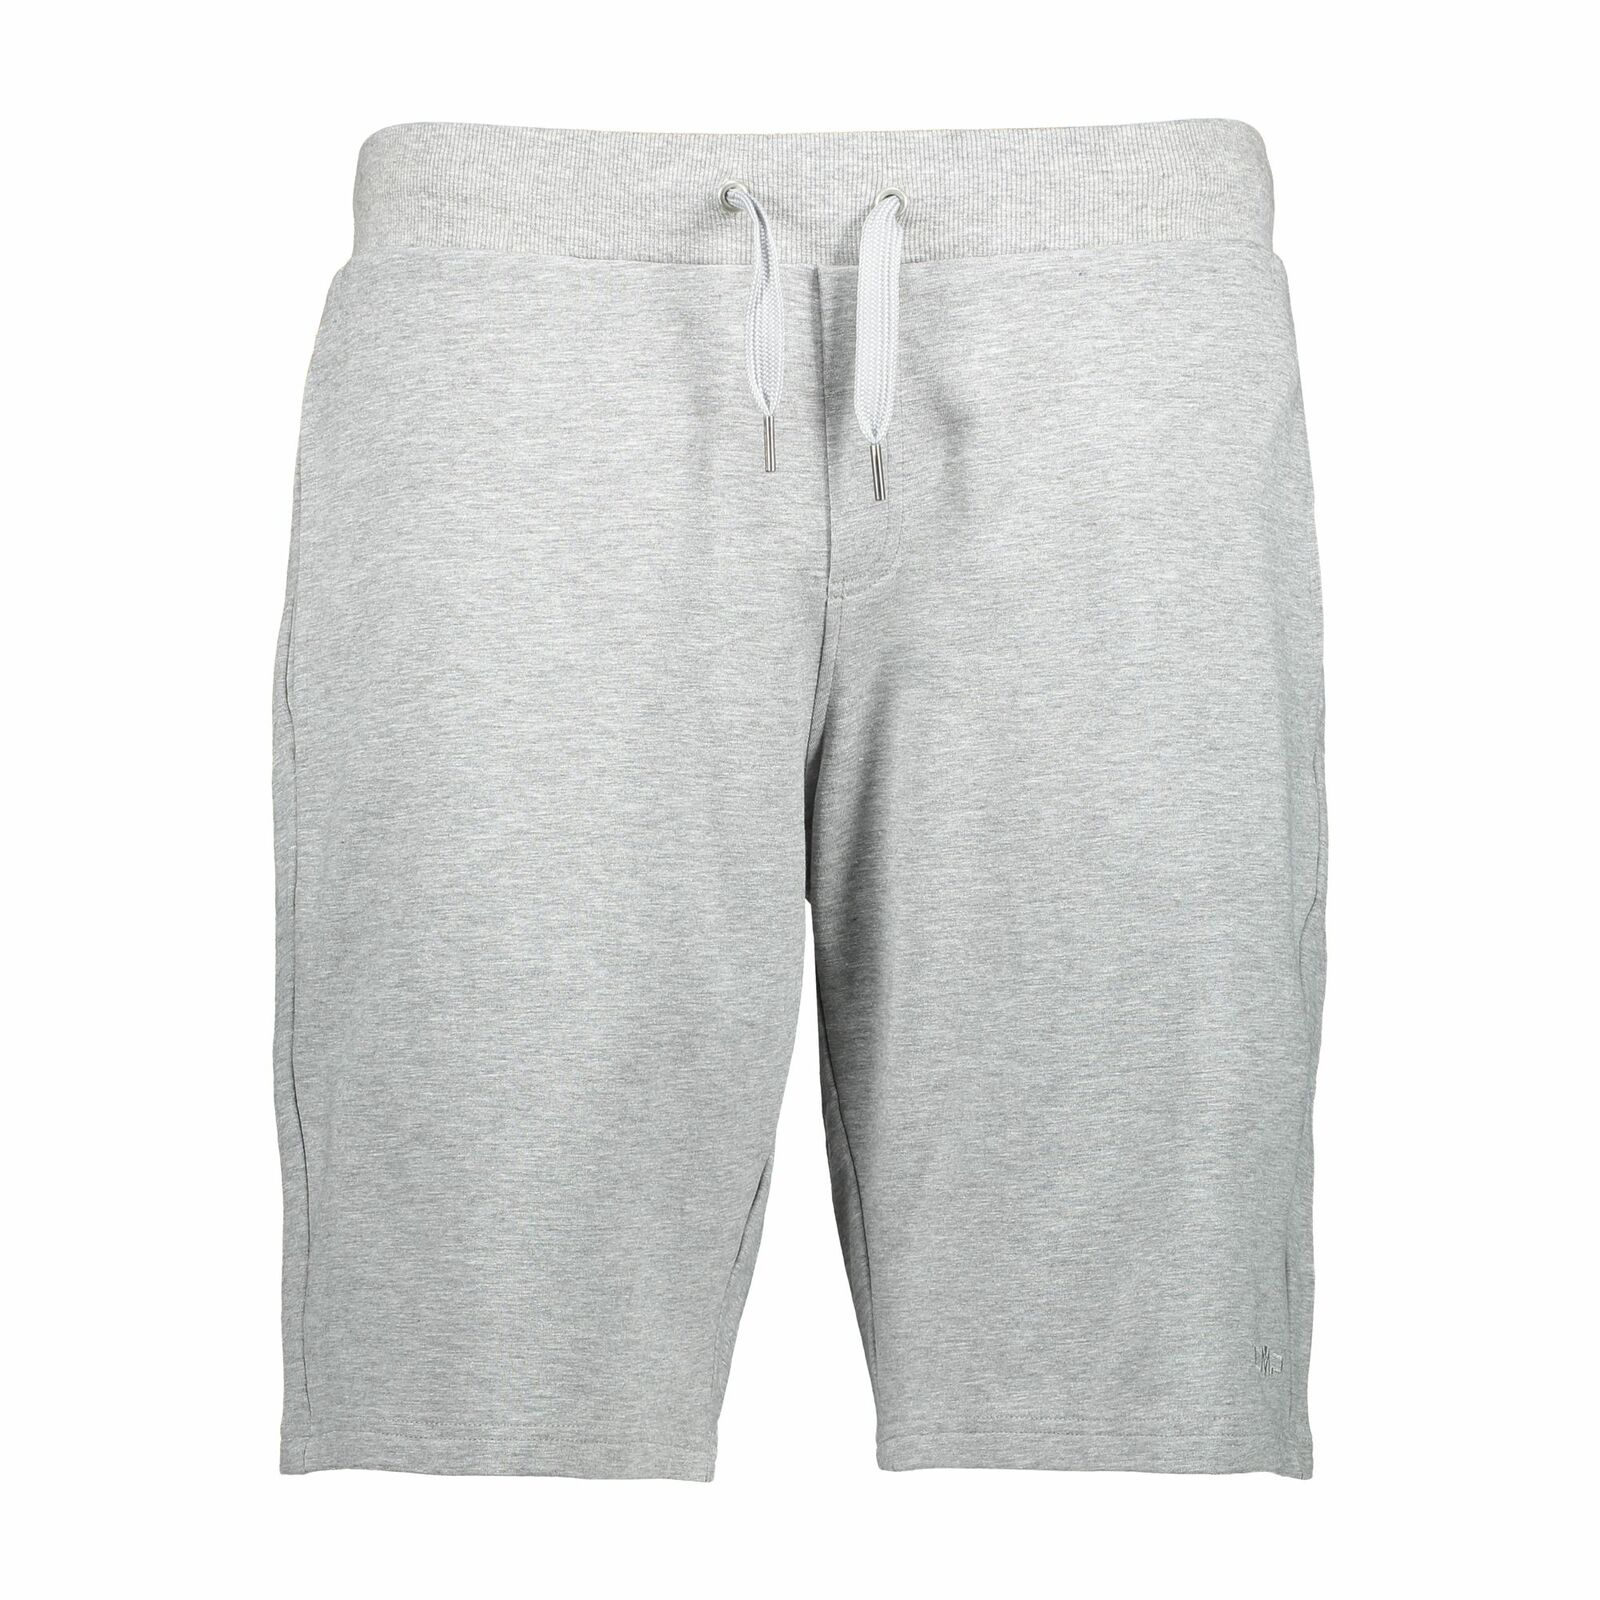 CMP Shorts Pantaloni Man Bermuda grey Melange Elasticizzato Terry Francese